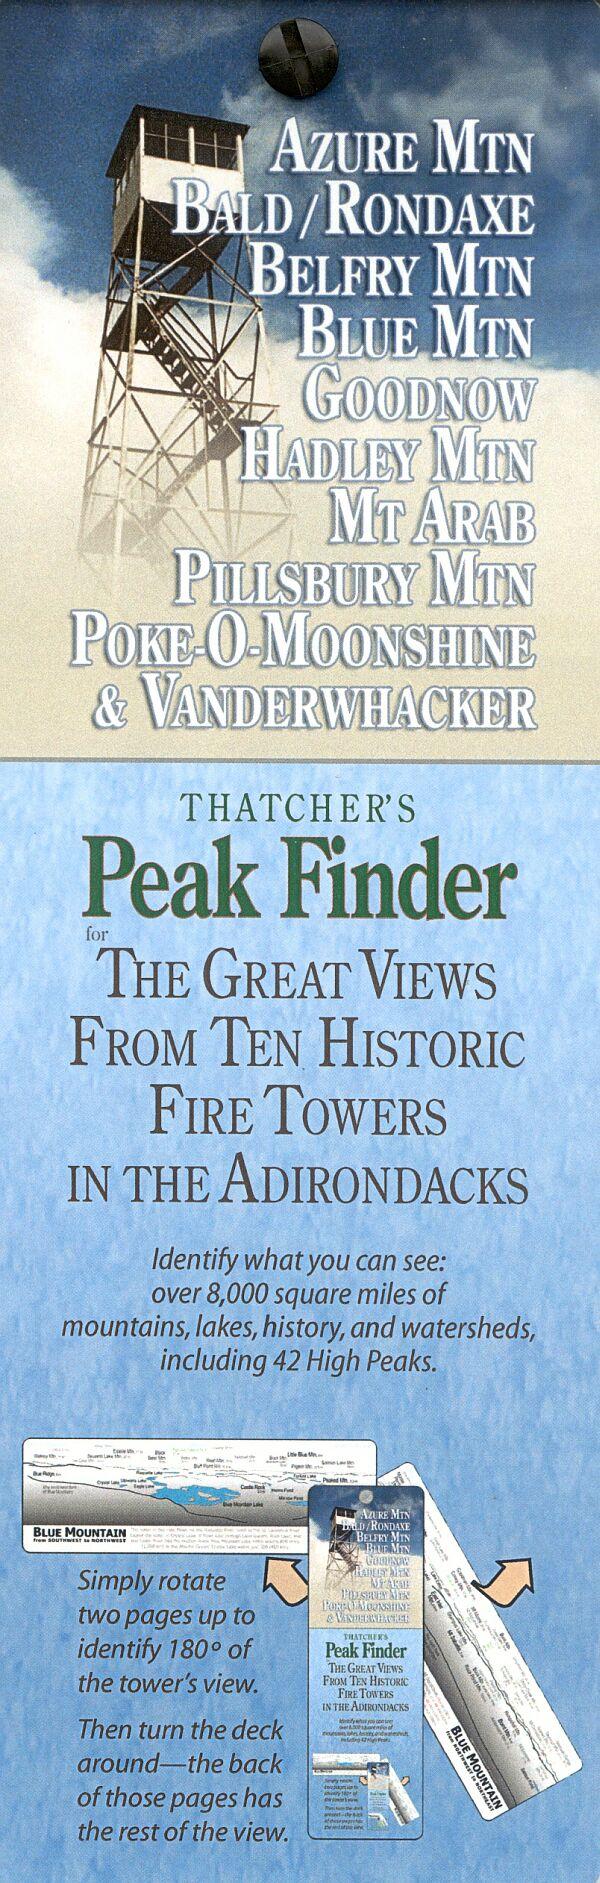 Thatcher's Peak Finder Fire Towers